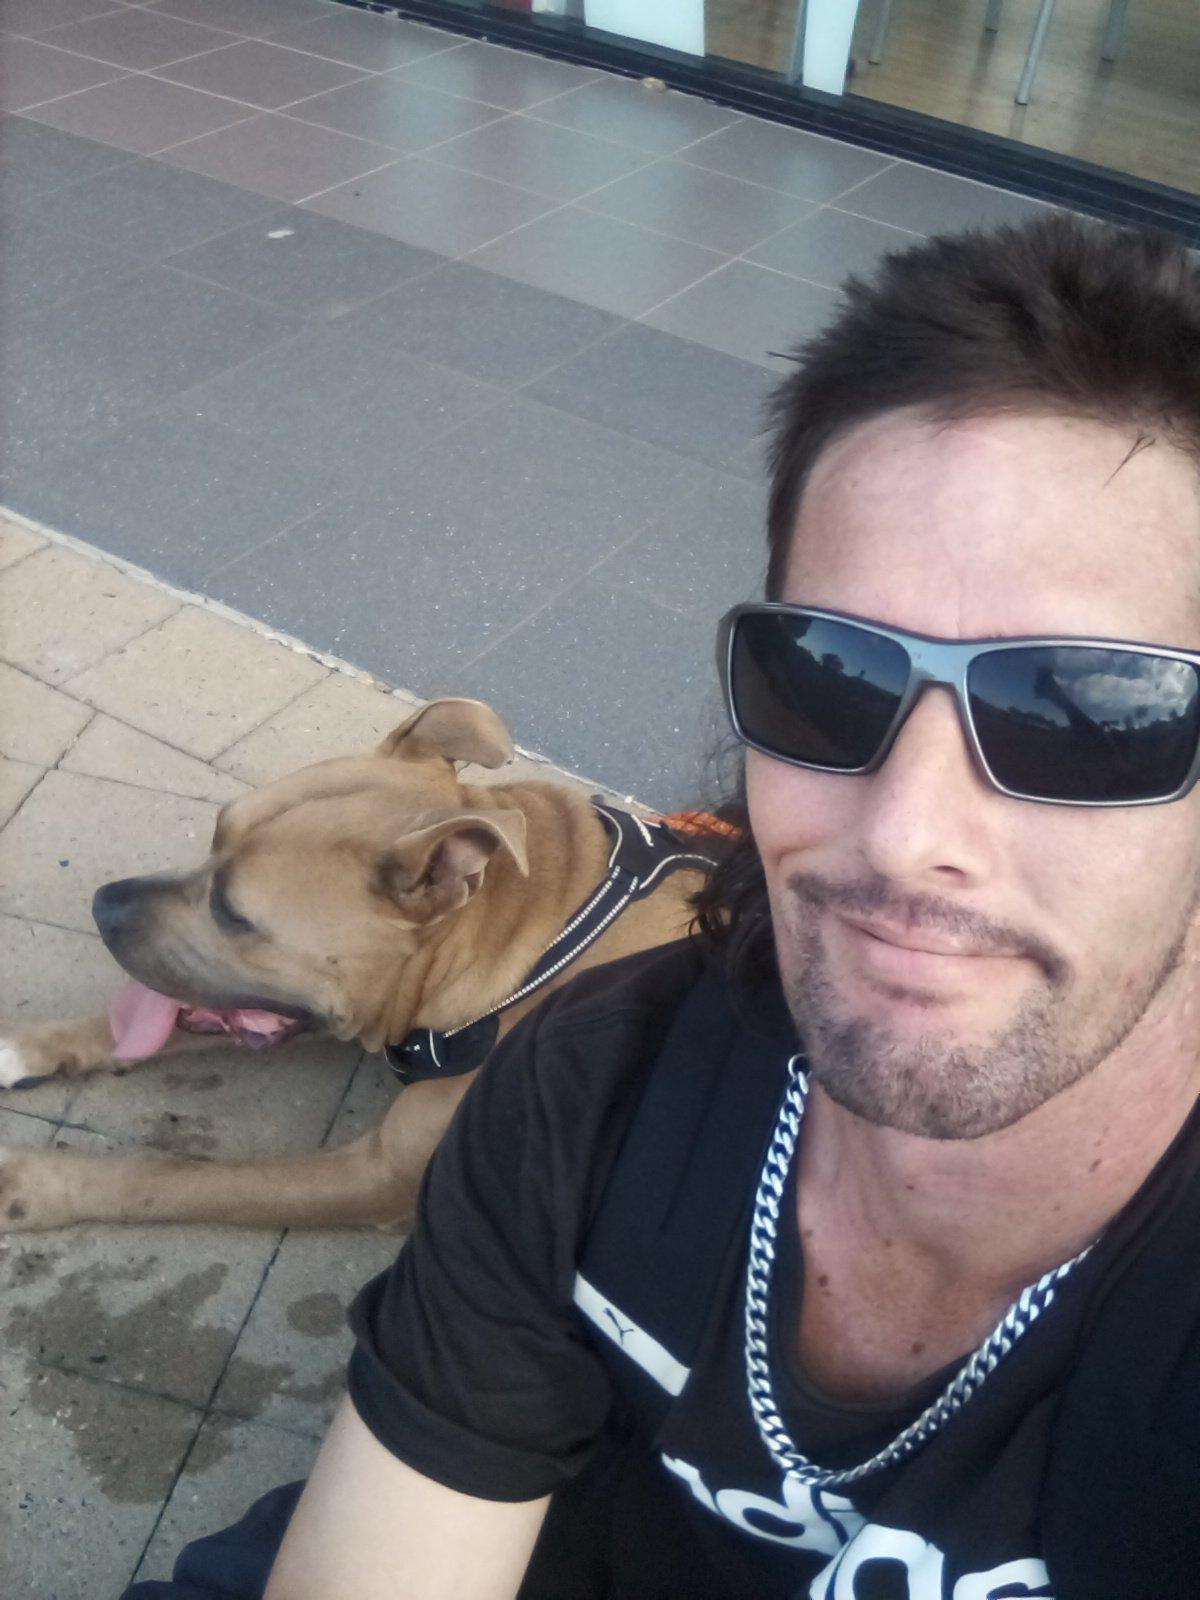 Mulletman from Queensland,Australia